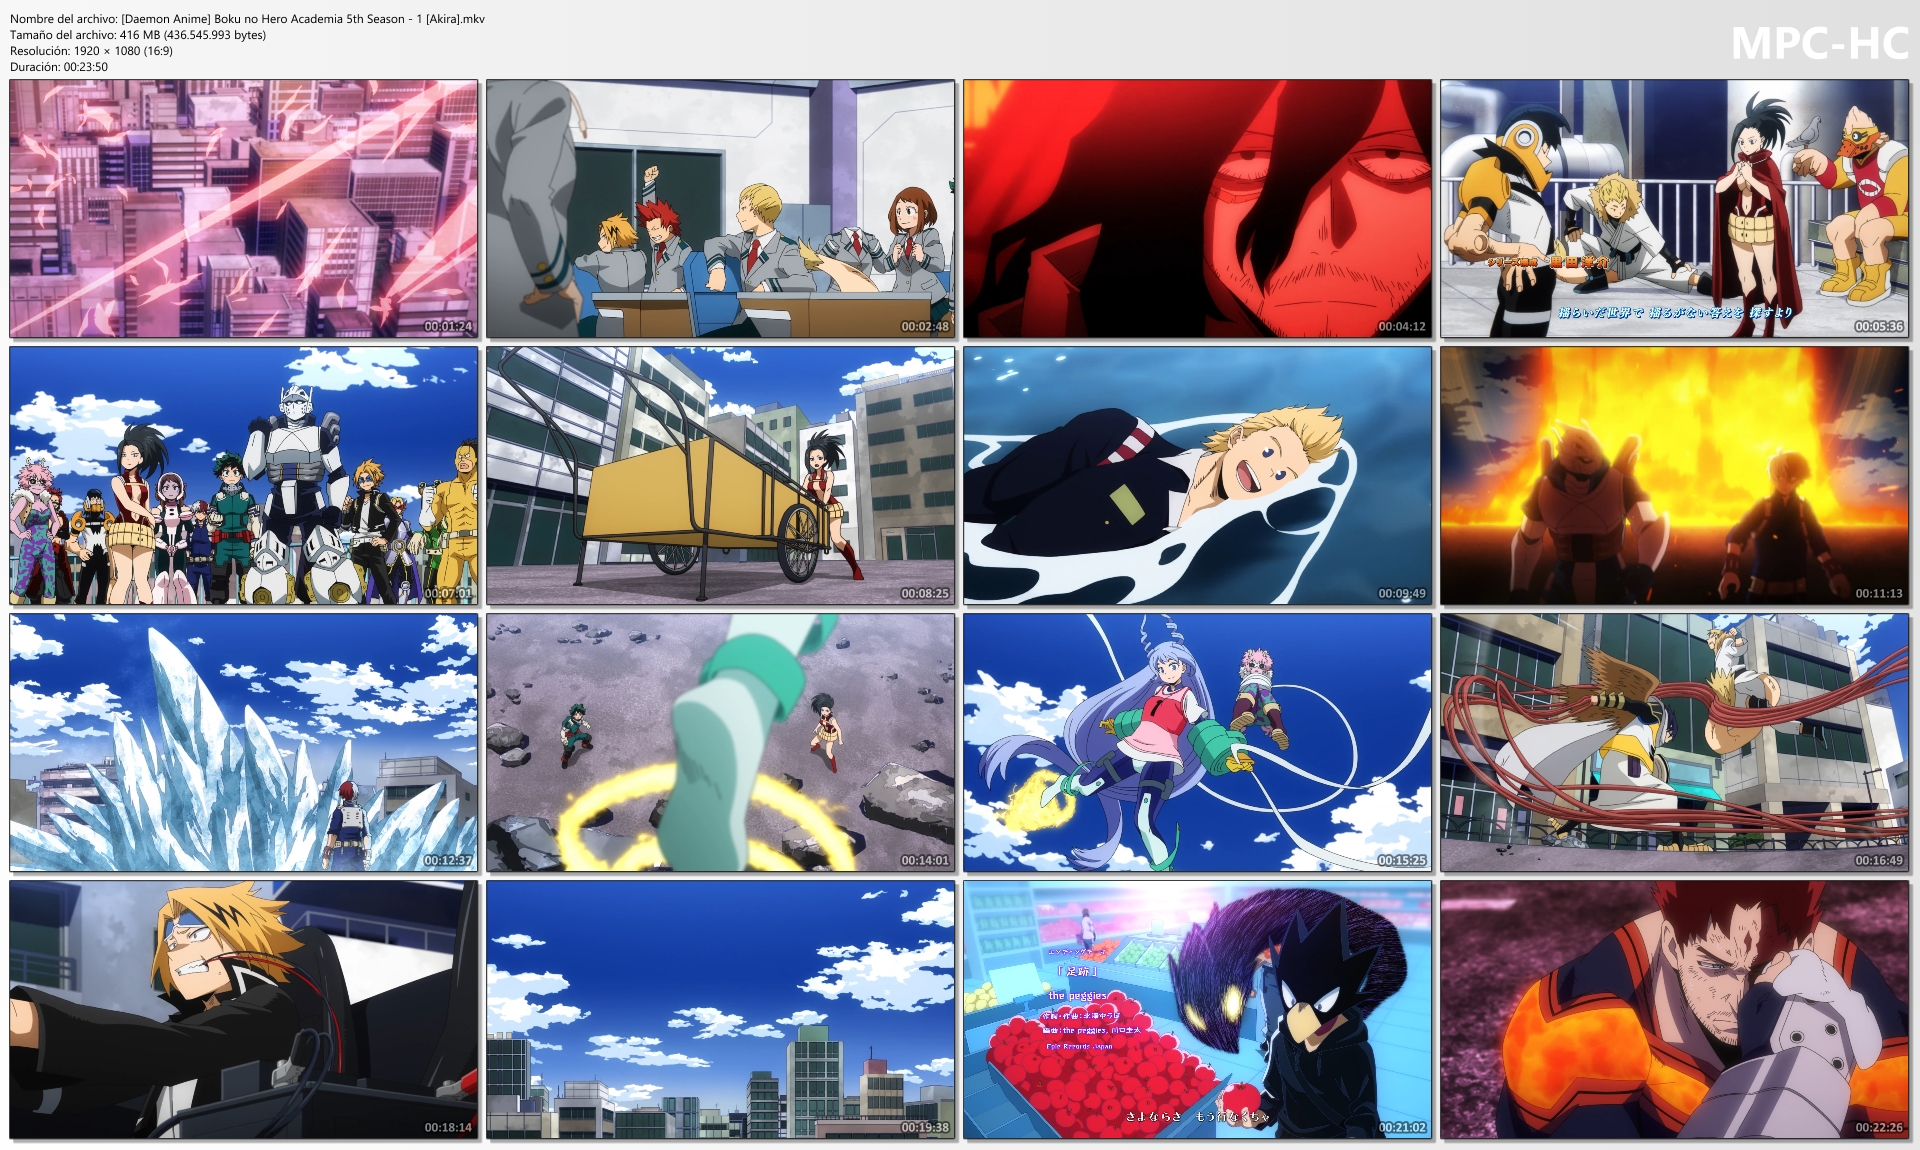 [Daemon Anime] Boku no Hero Academia 5th Season 1 [Akira].mkv thumbs